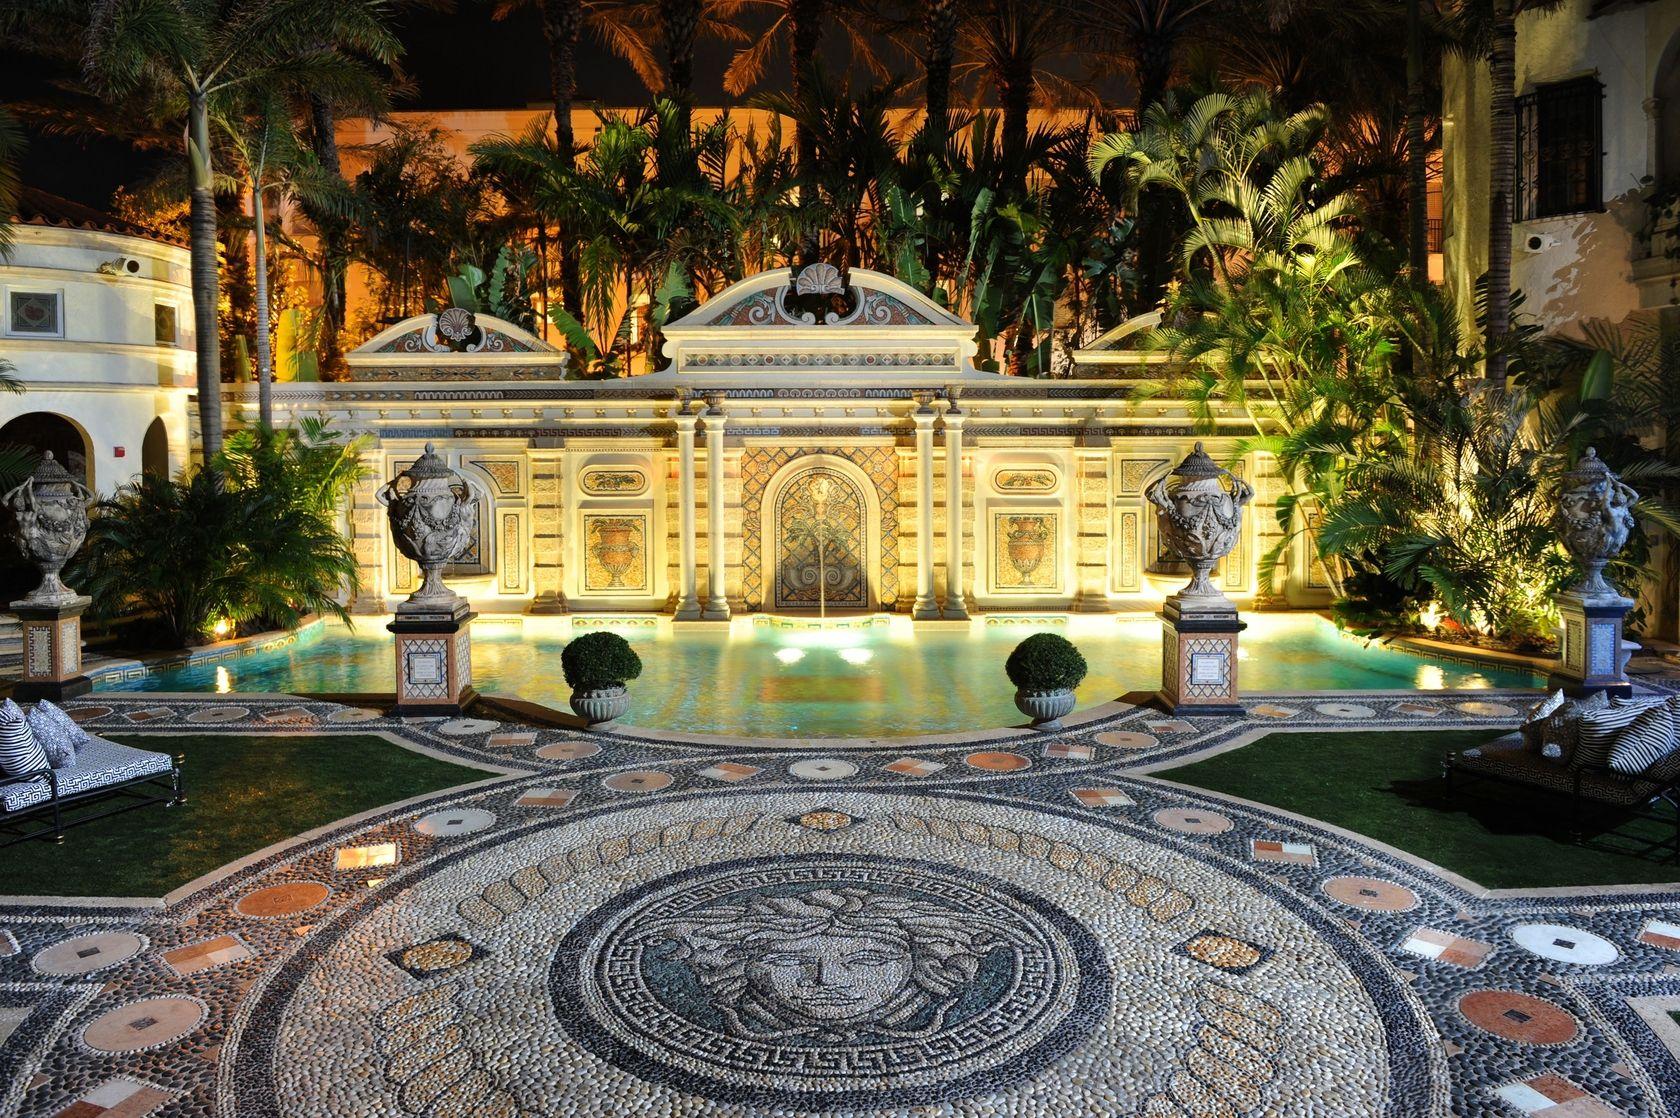 La Fastueuse De Gianni Versace « Bradée » à 41 Millions De Dollars